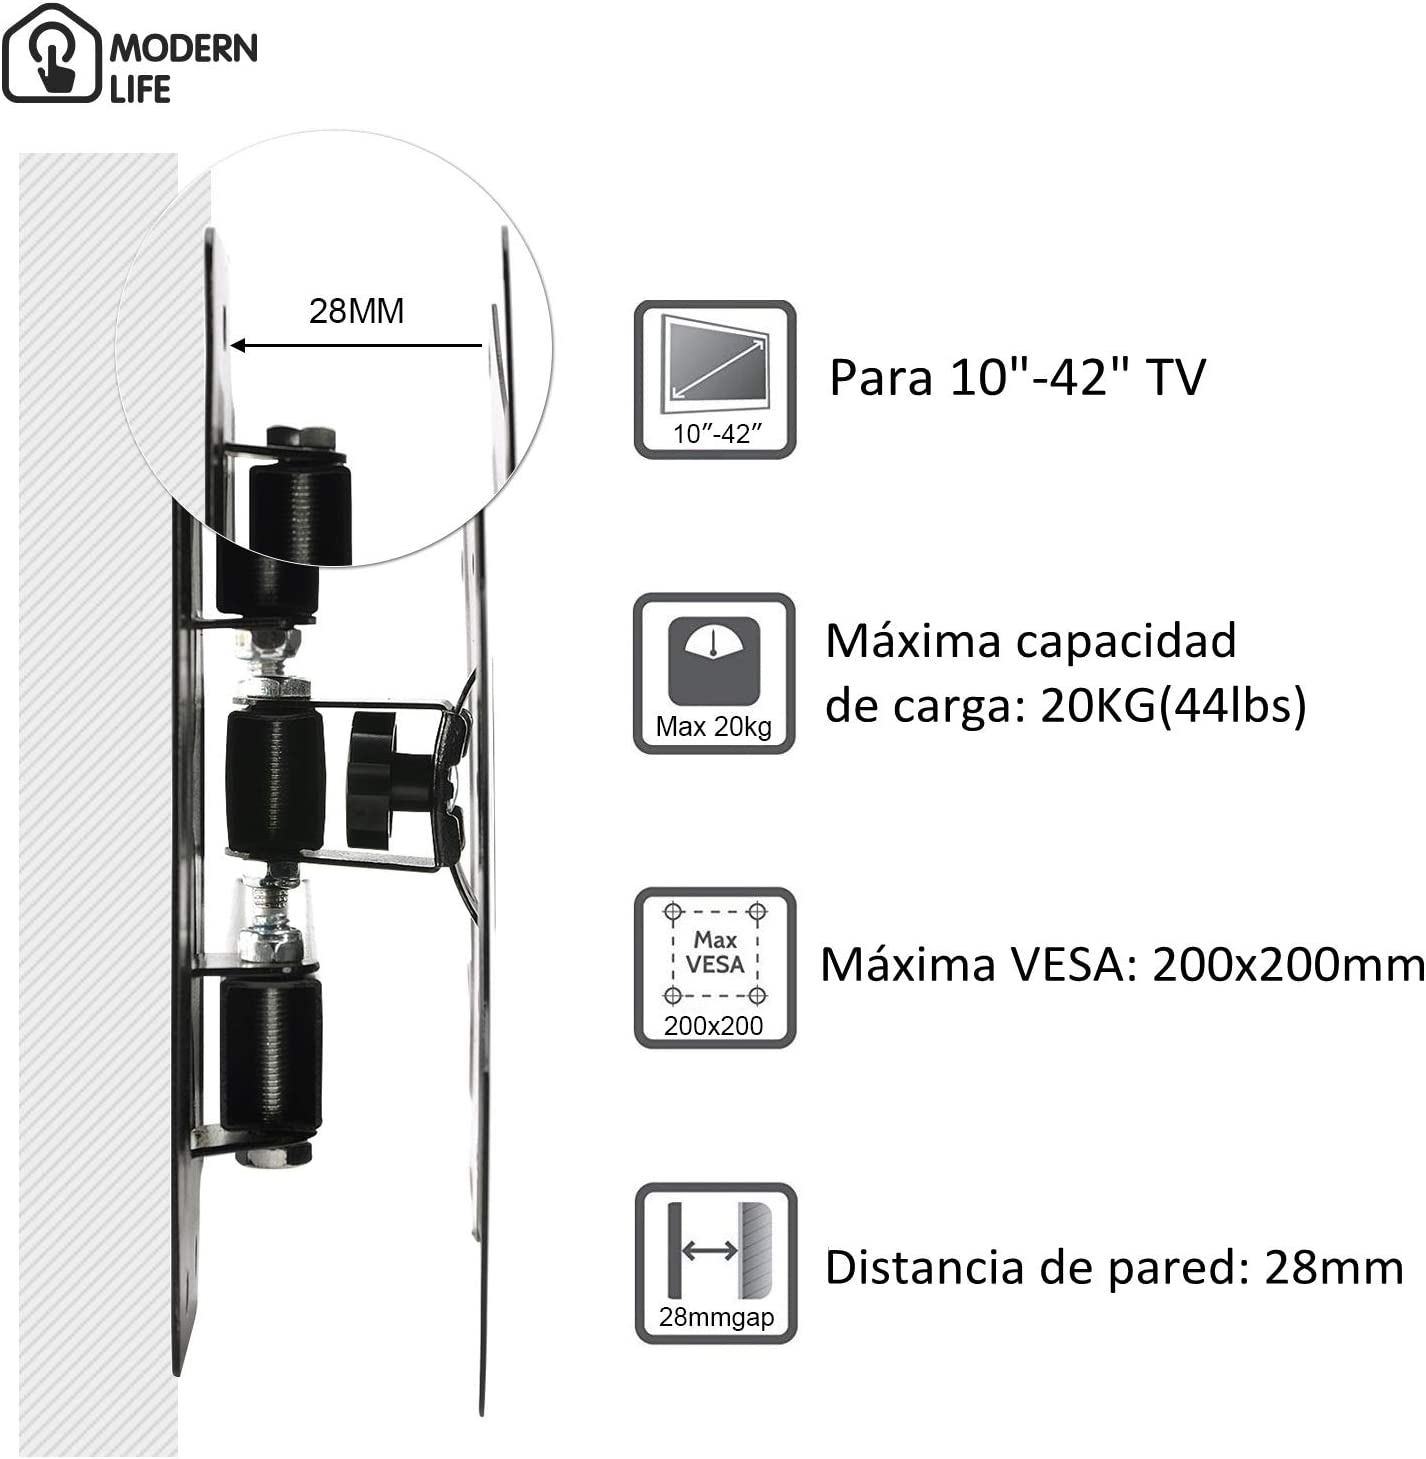 MODERN LIFE Soporte de Pared para TV 14-37 Pulgadas(35-94cm), Inclinable y Giratorio, Máx Vesa 200x200mm, Carga 20KG(44lbs), para Televisores de Pantalla Plana(LED LCD Plasma 4K 3D): Amazon.es: Electrónica